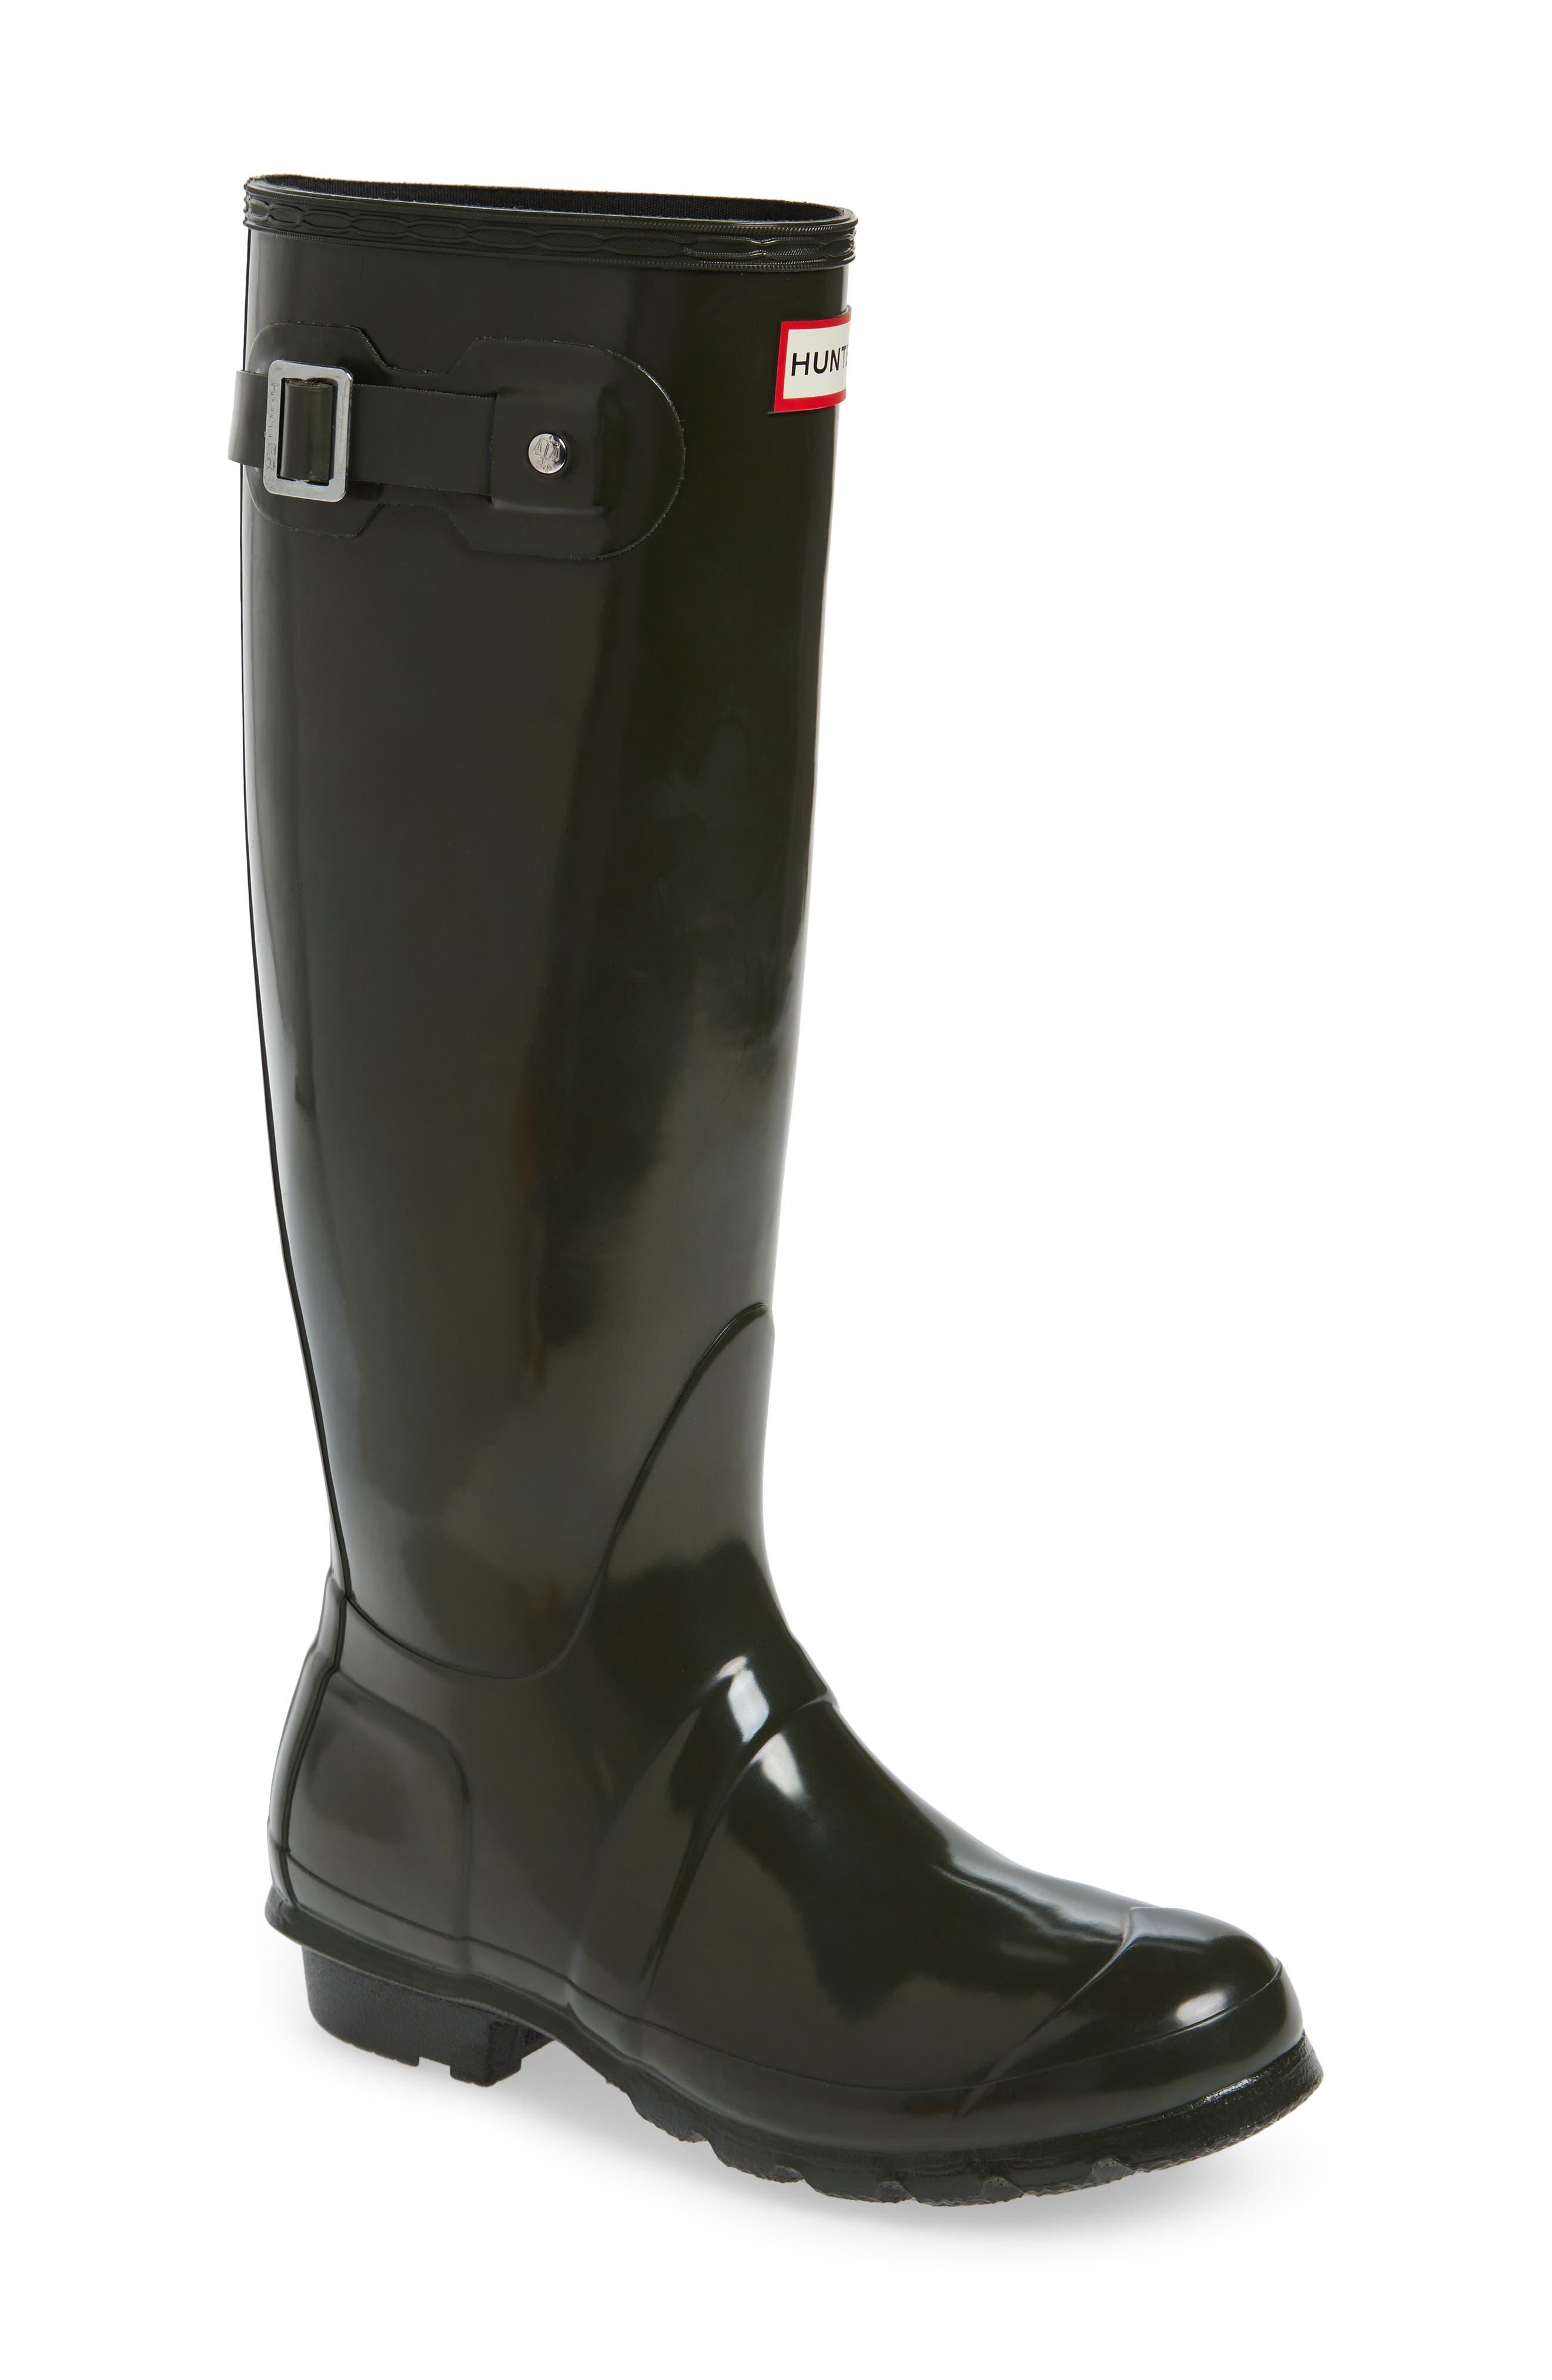 Boots \u0026 Booties Clearance   Nordstrom Rack